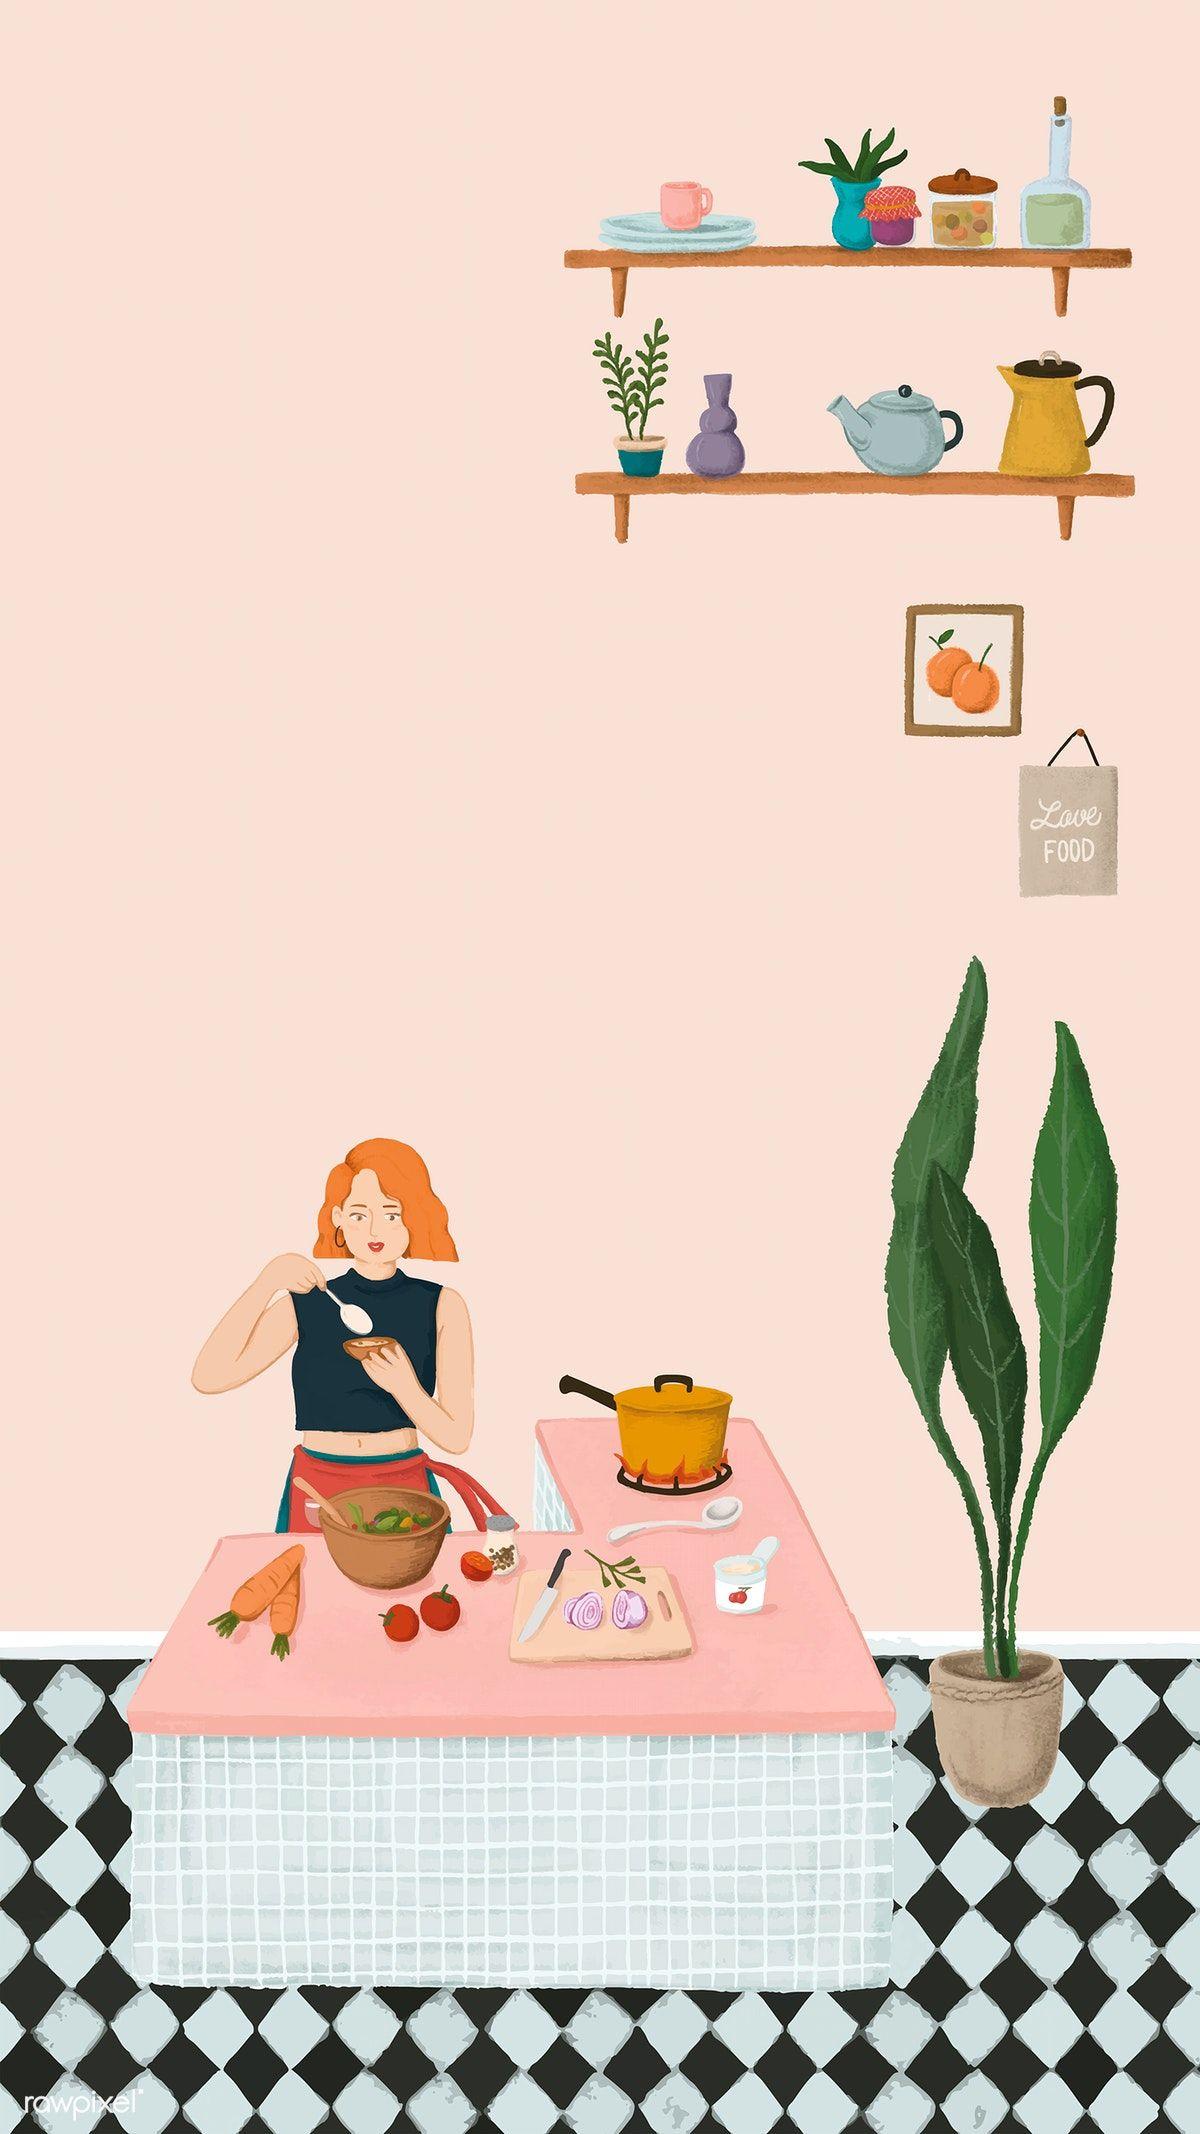 Download Premium Vector Of Girl Cooking In A Kitchen Sketch Style Mobile Ilustrasi Karakter Ilustrasi Ilustrasi Grafis